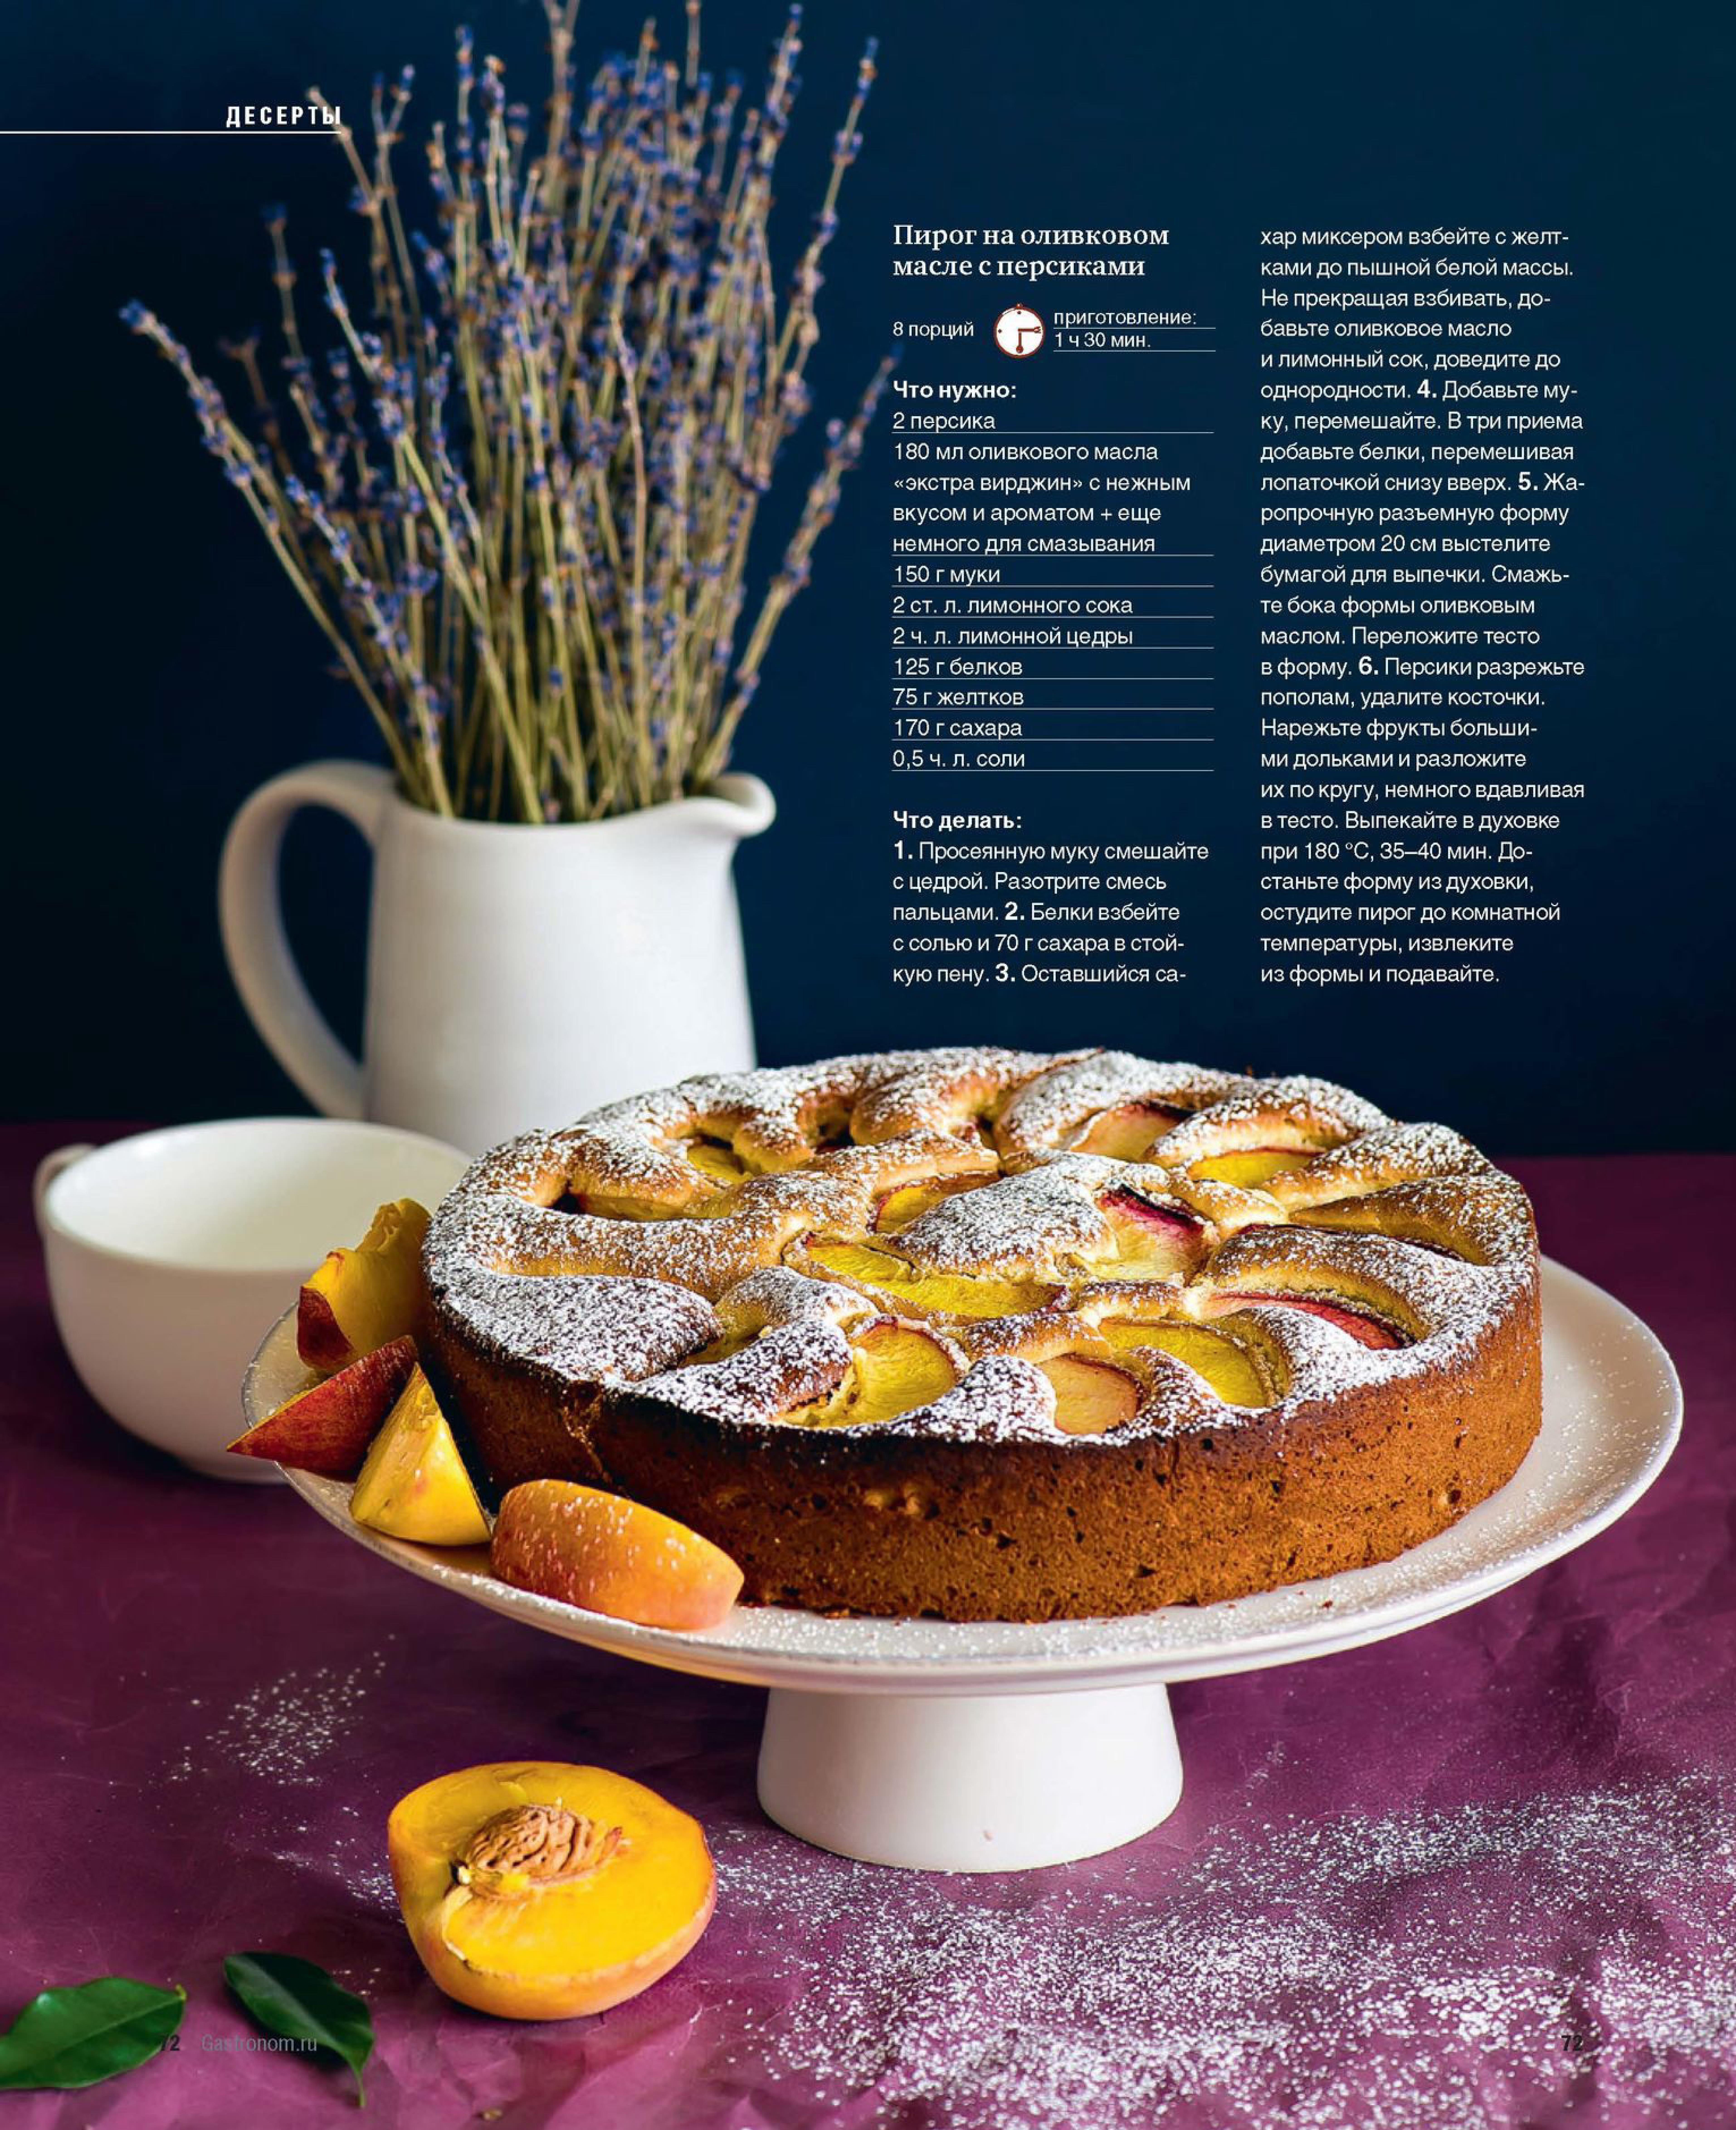 Пирог на оливковом масле с персиком in 2020 | Food and ...